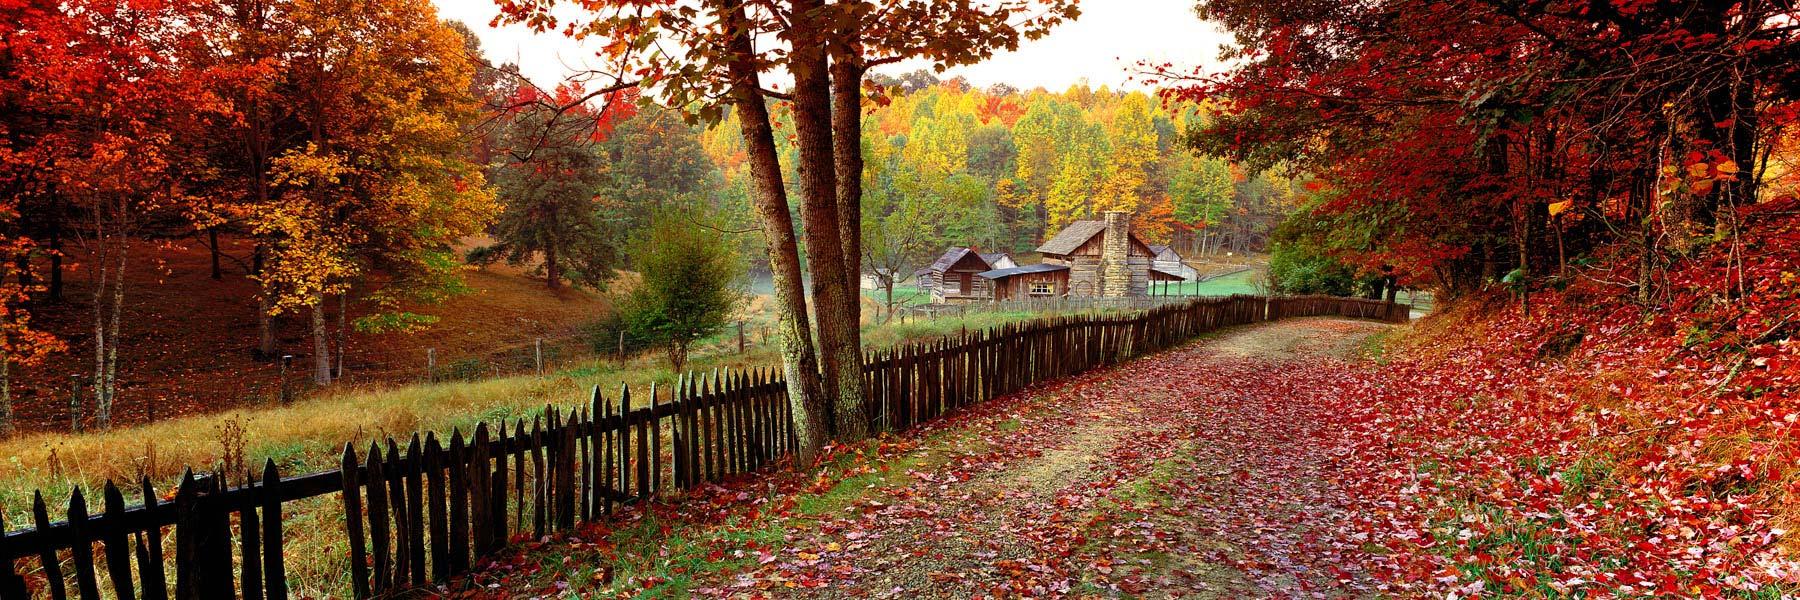 Autumn colours, Pioneer Farm, West Virginia, USA.